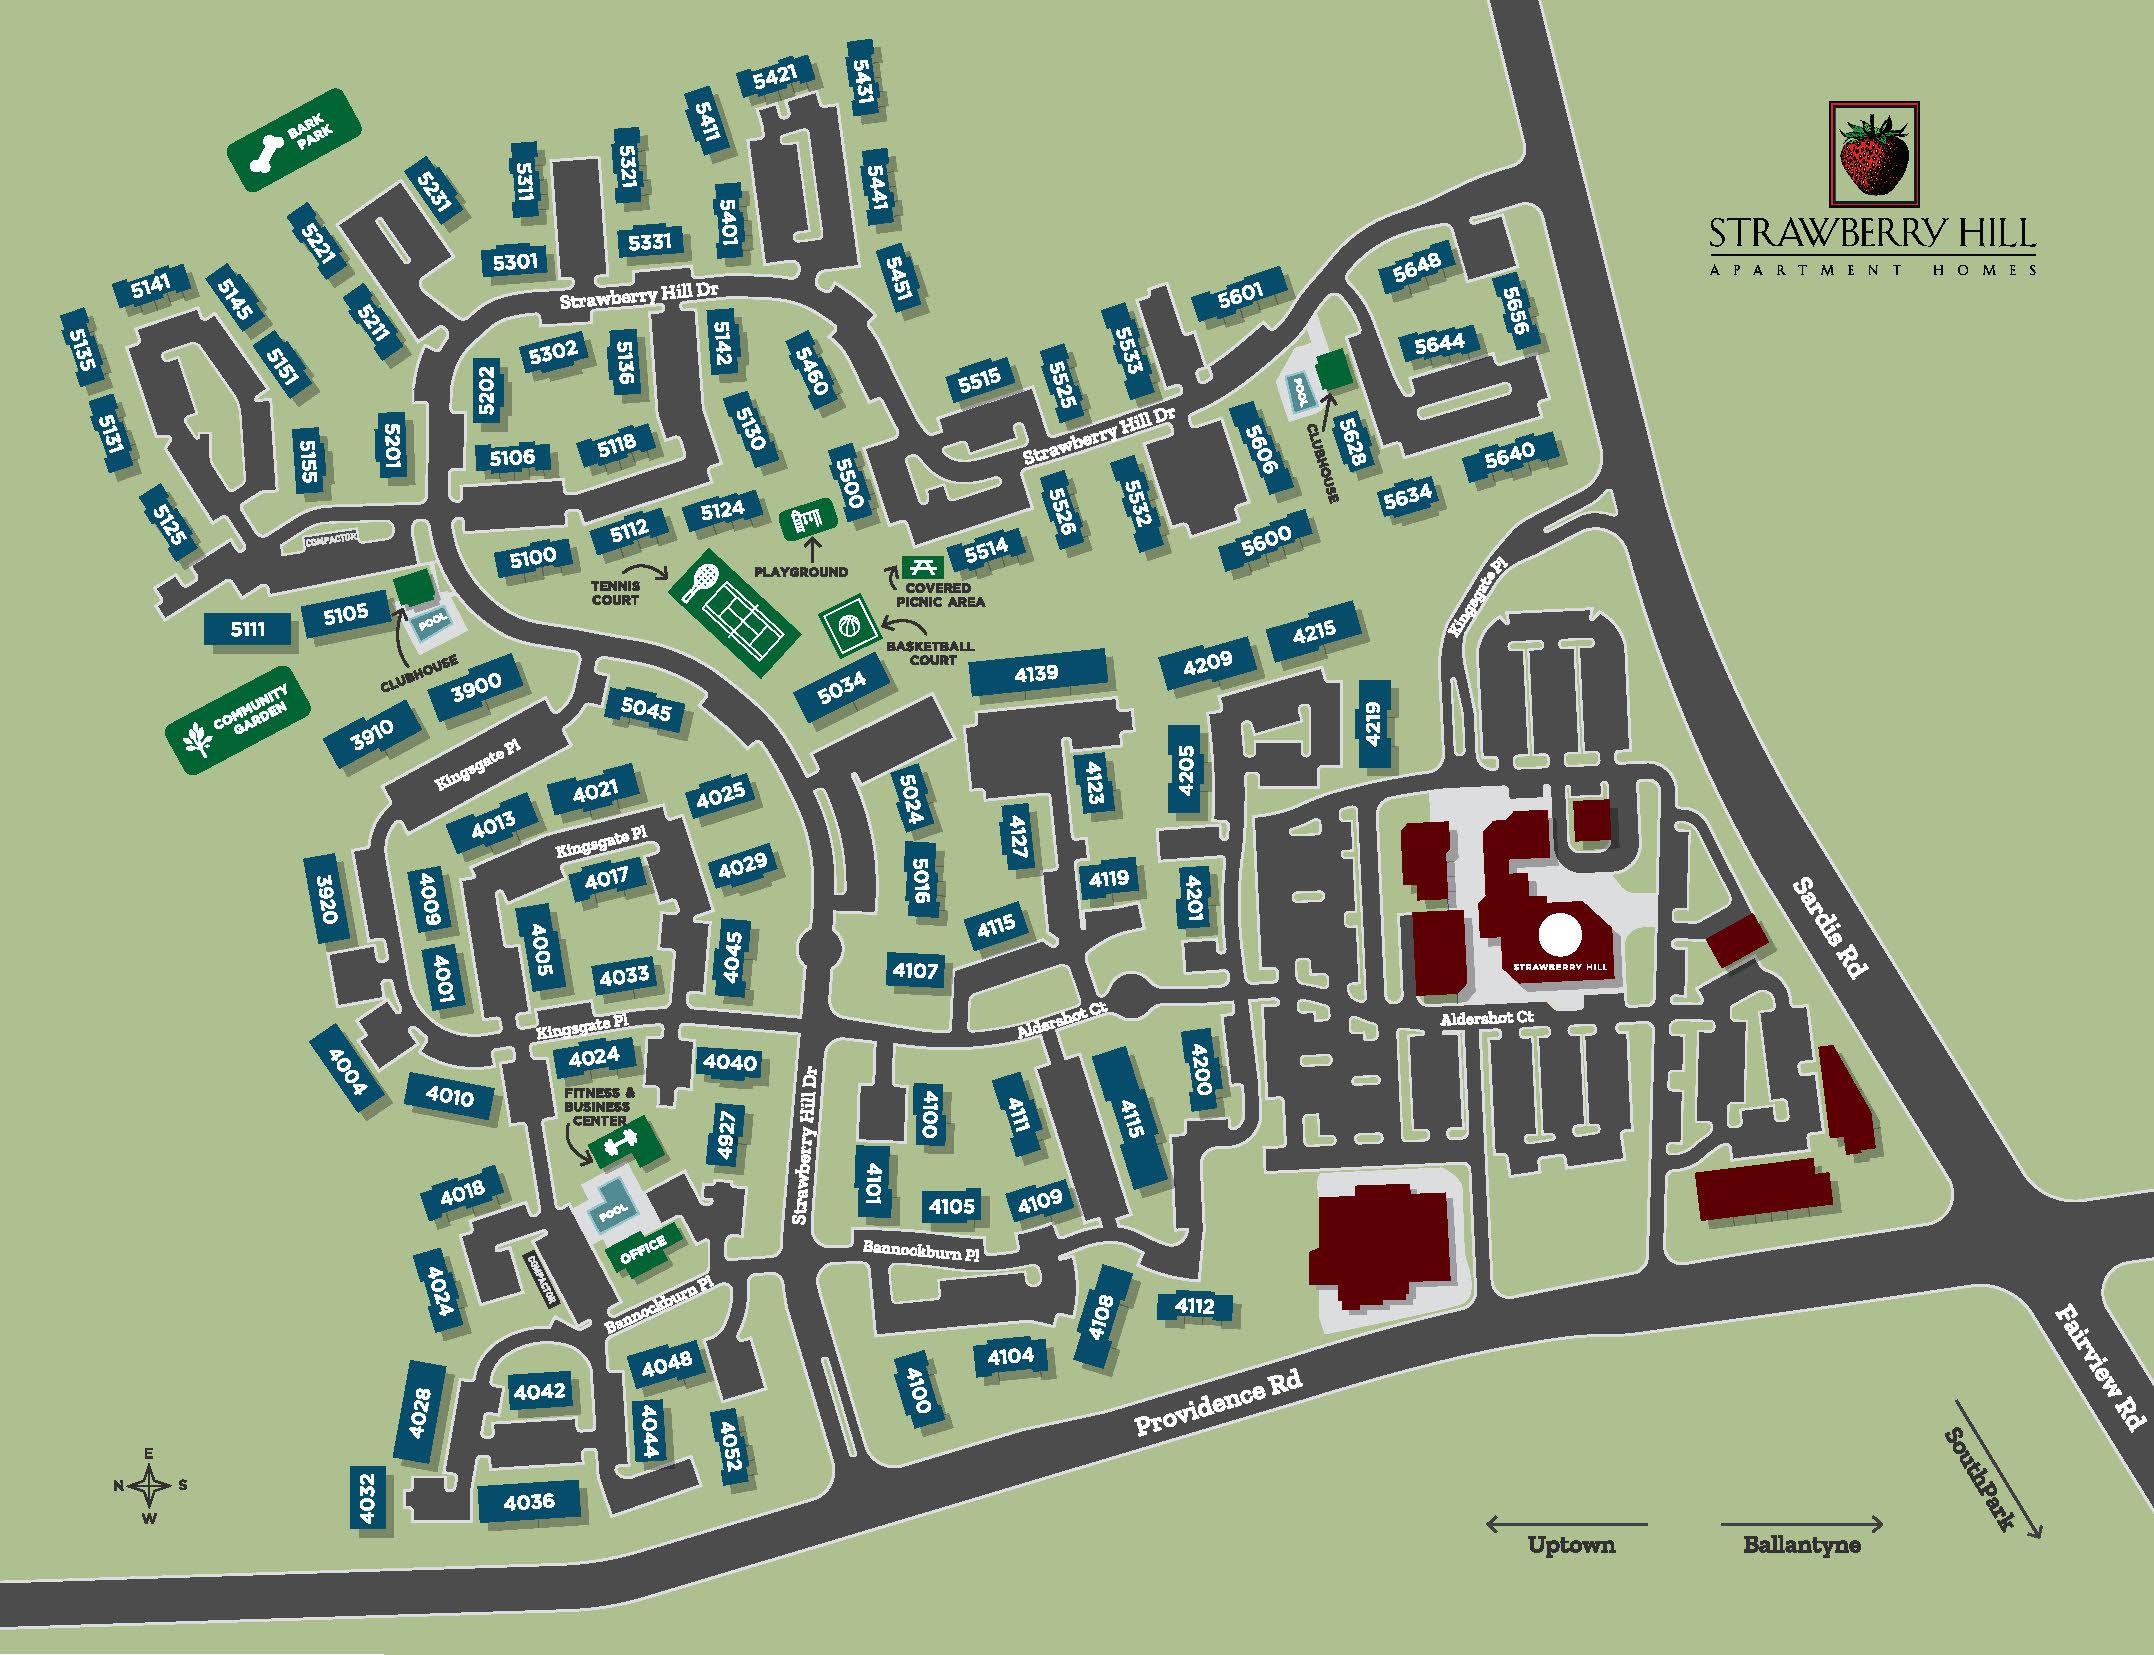 Strawberry Hill Siteplan